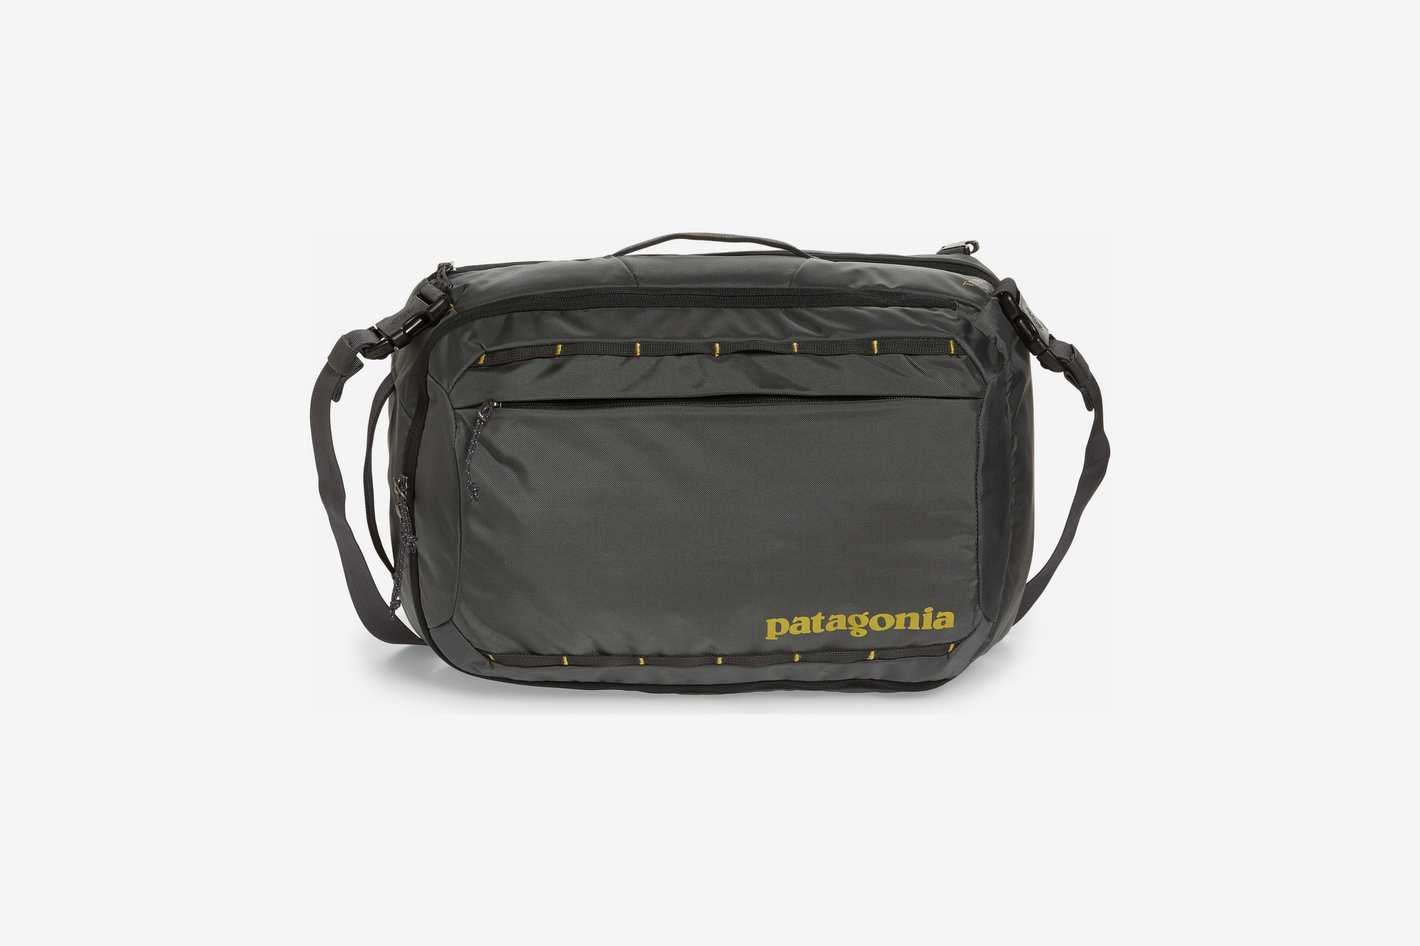 Patagonia Tres 25-Liter Convertible Backpack